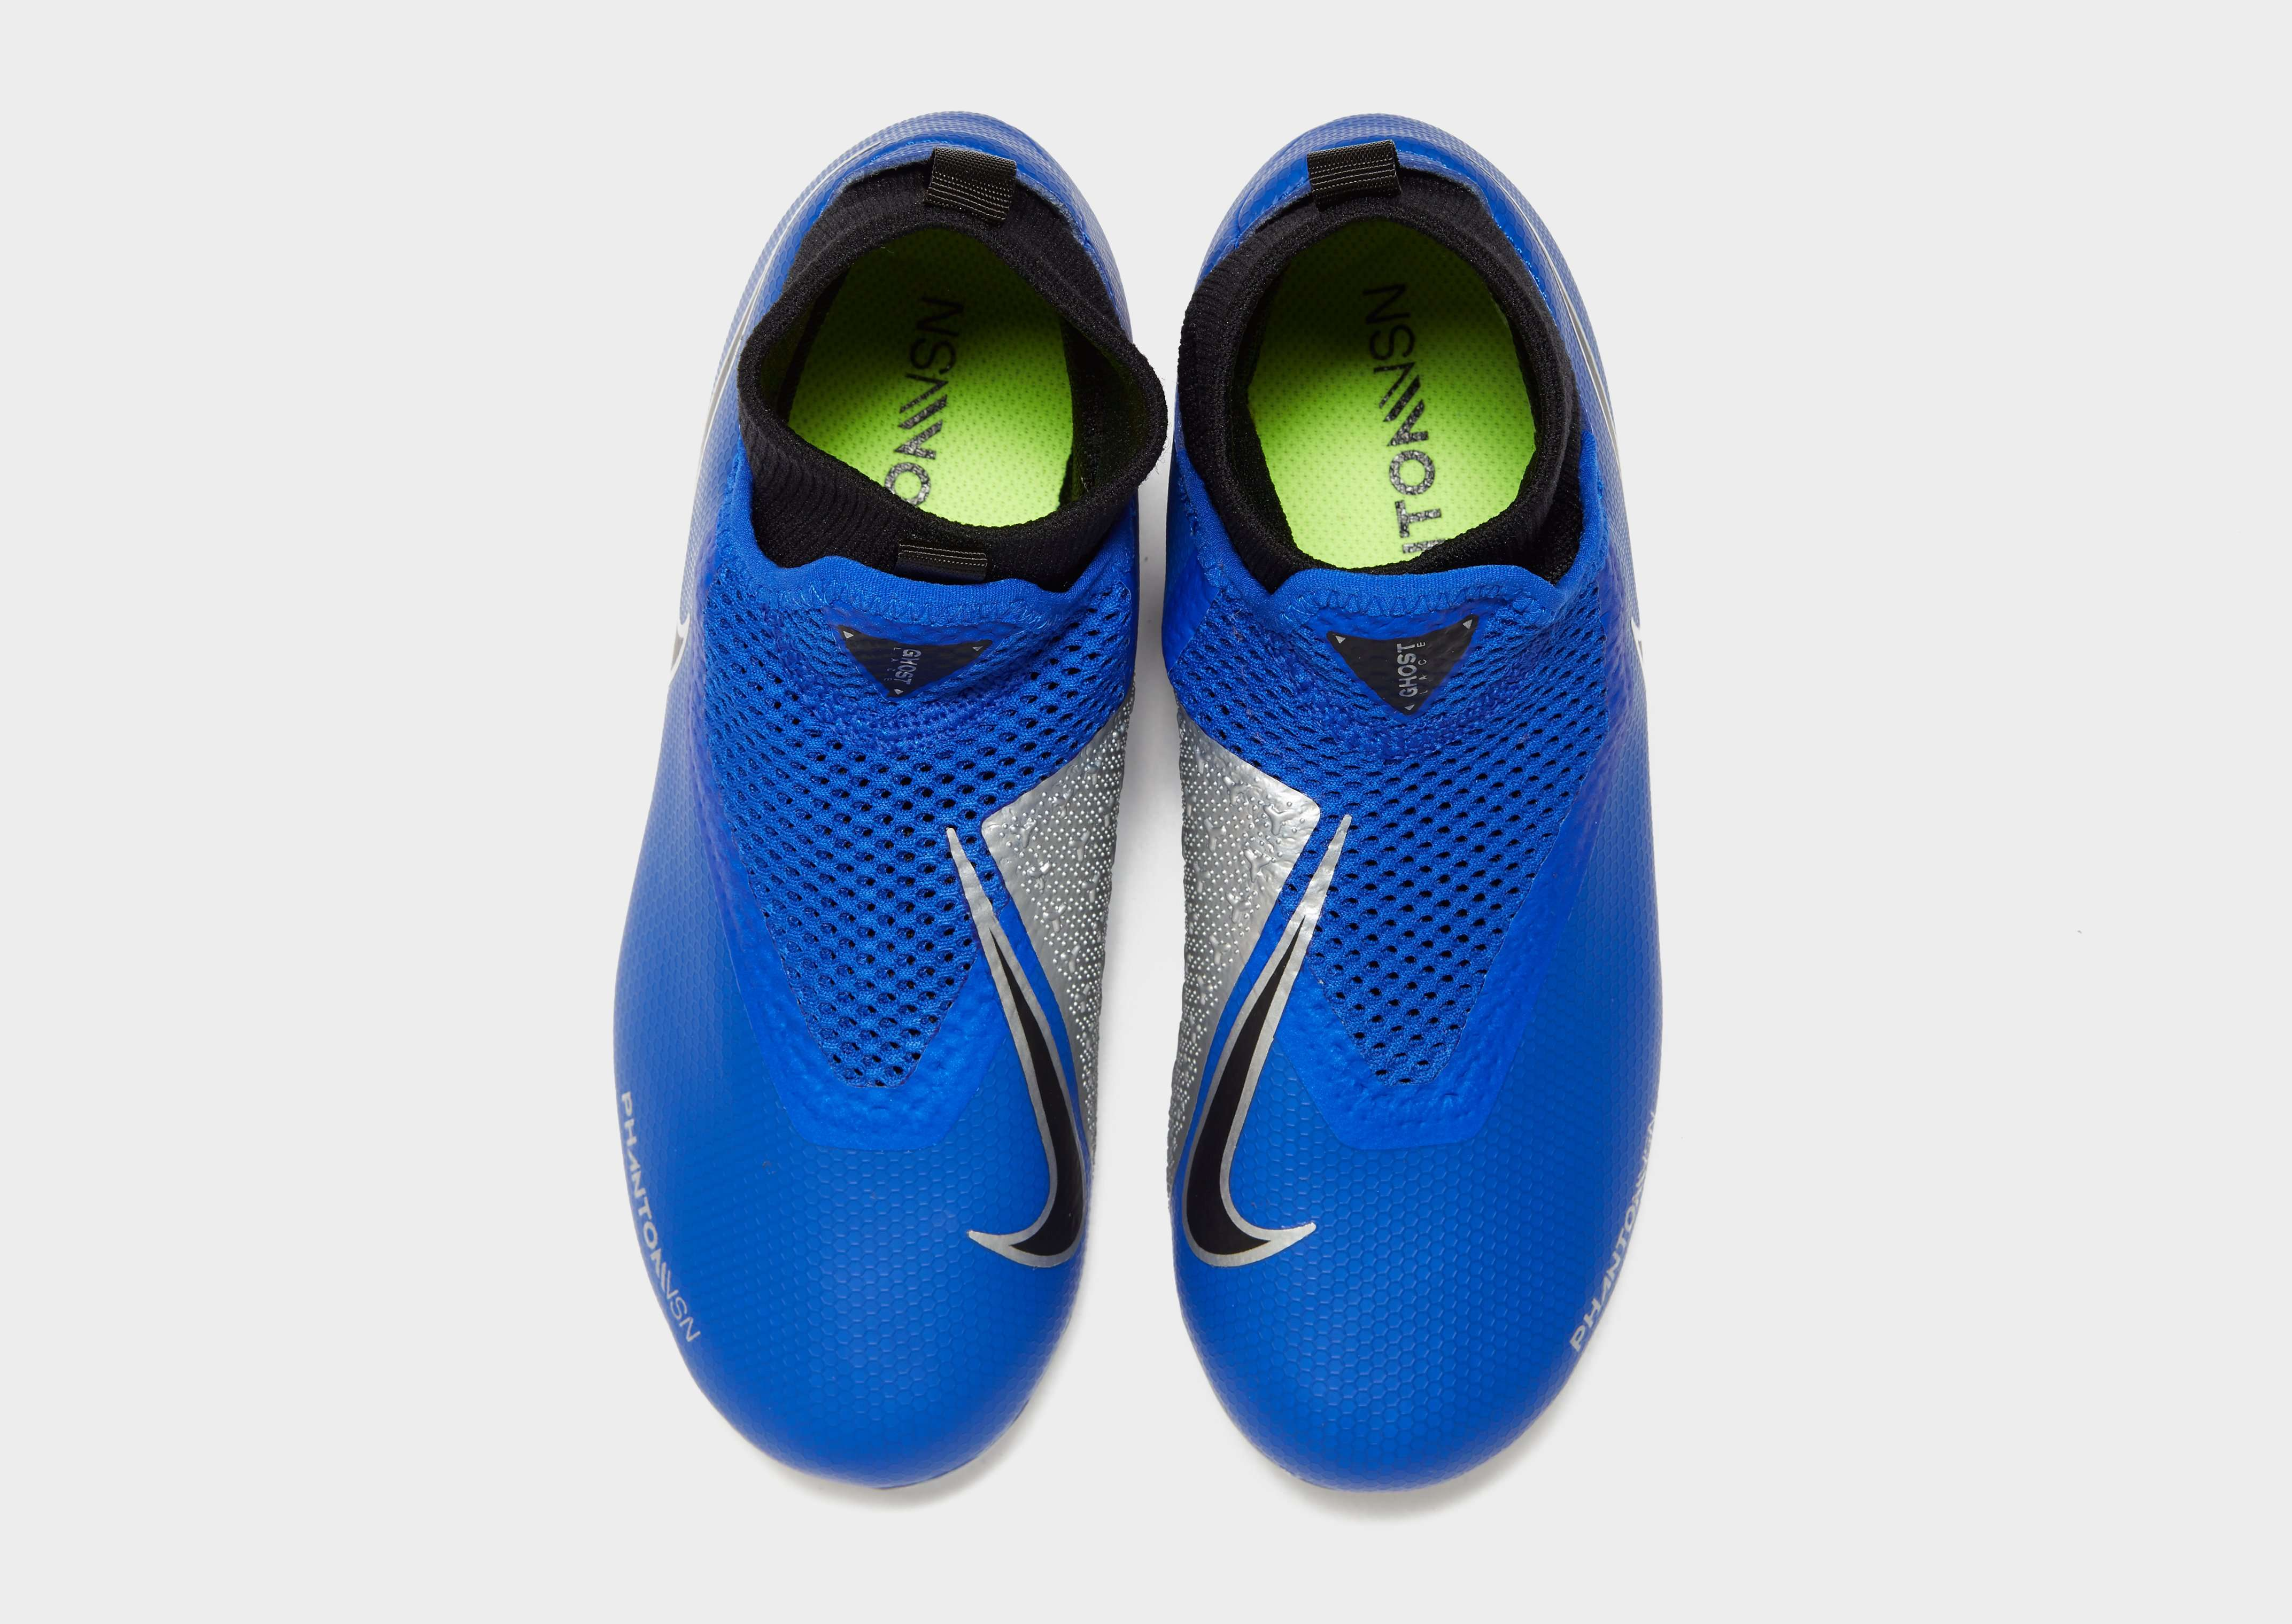 Nike Always Forward Phantom VSN Academy MG Children